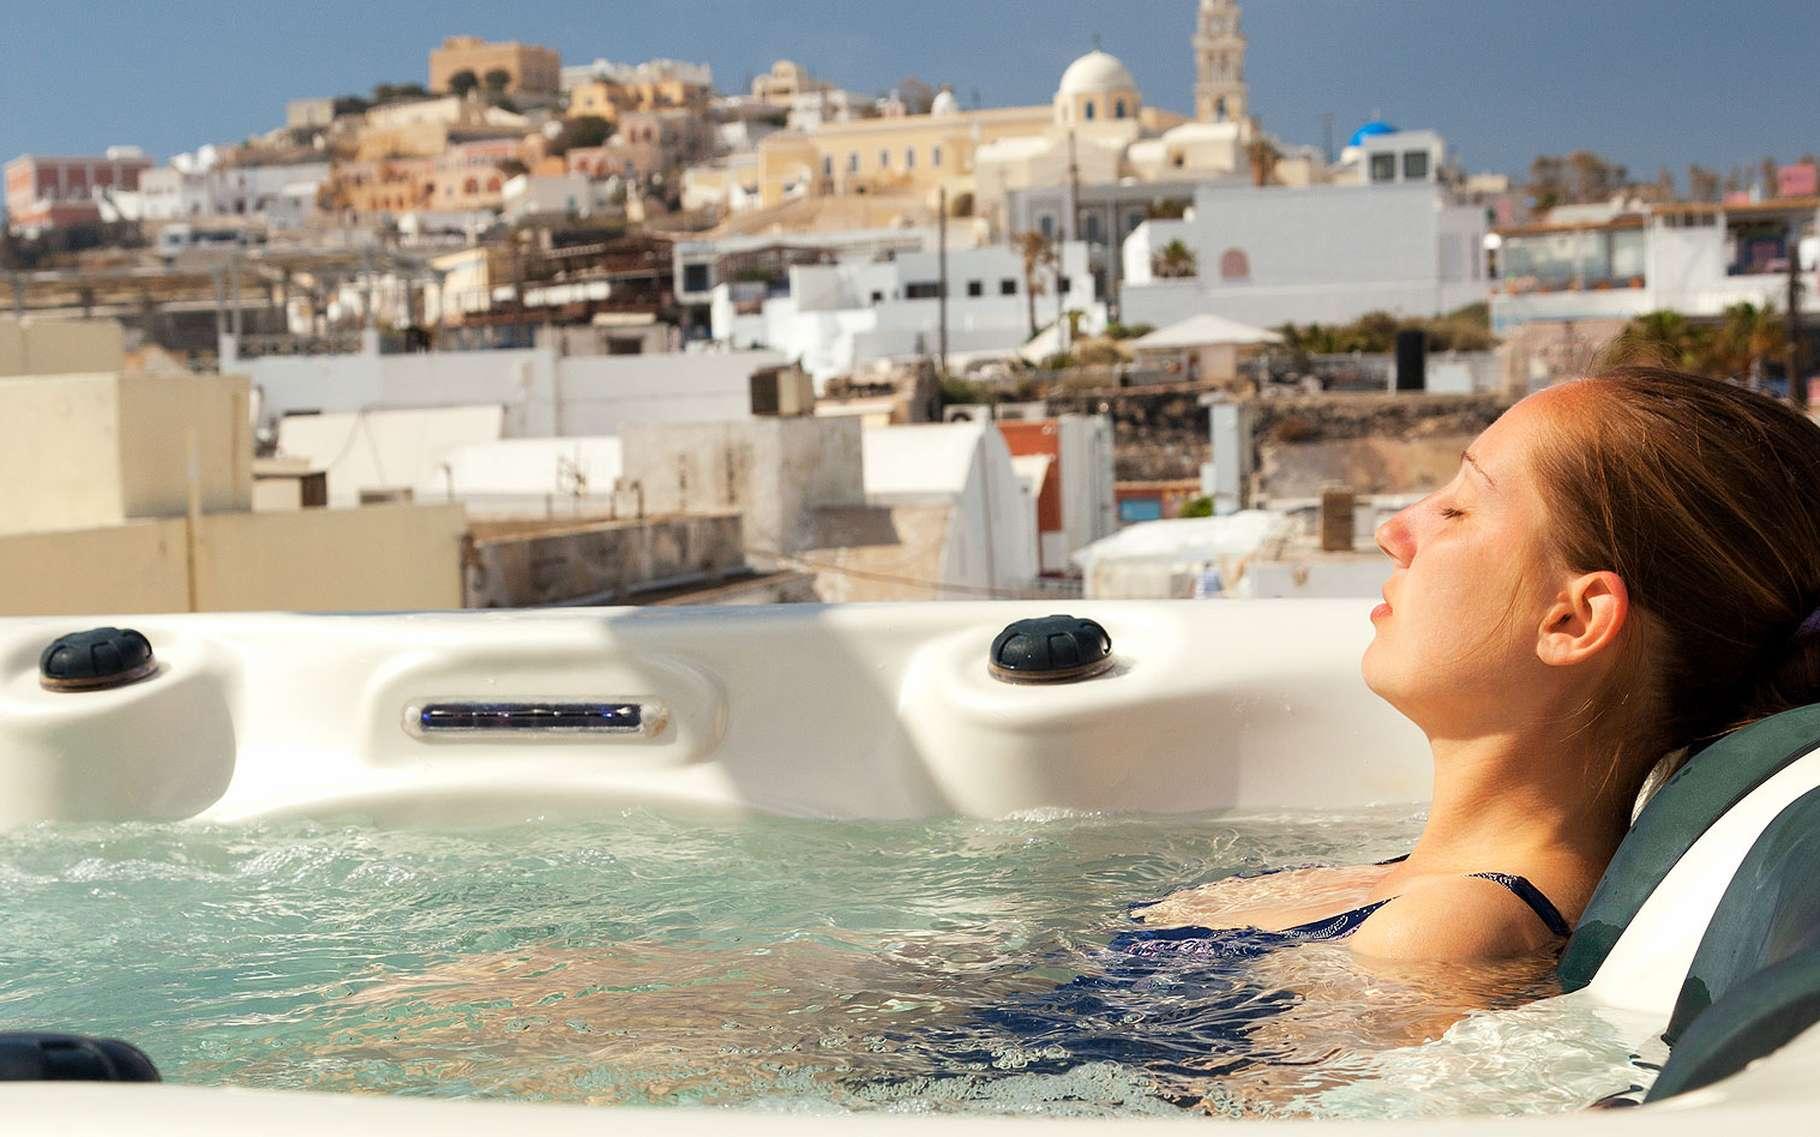 Entretien Spa Gonflable Forum choisir son spa | dossier